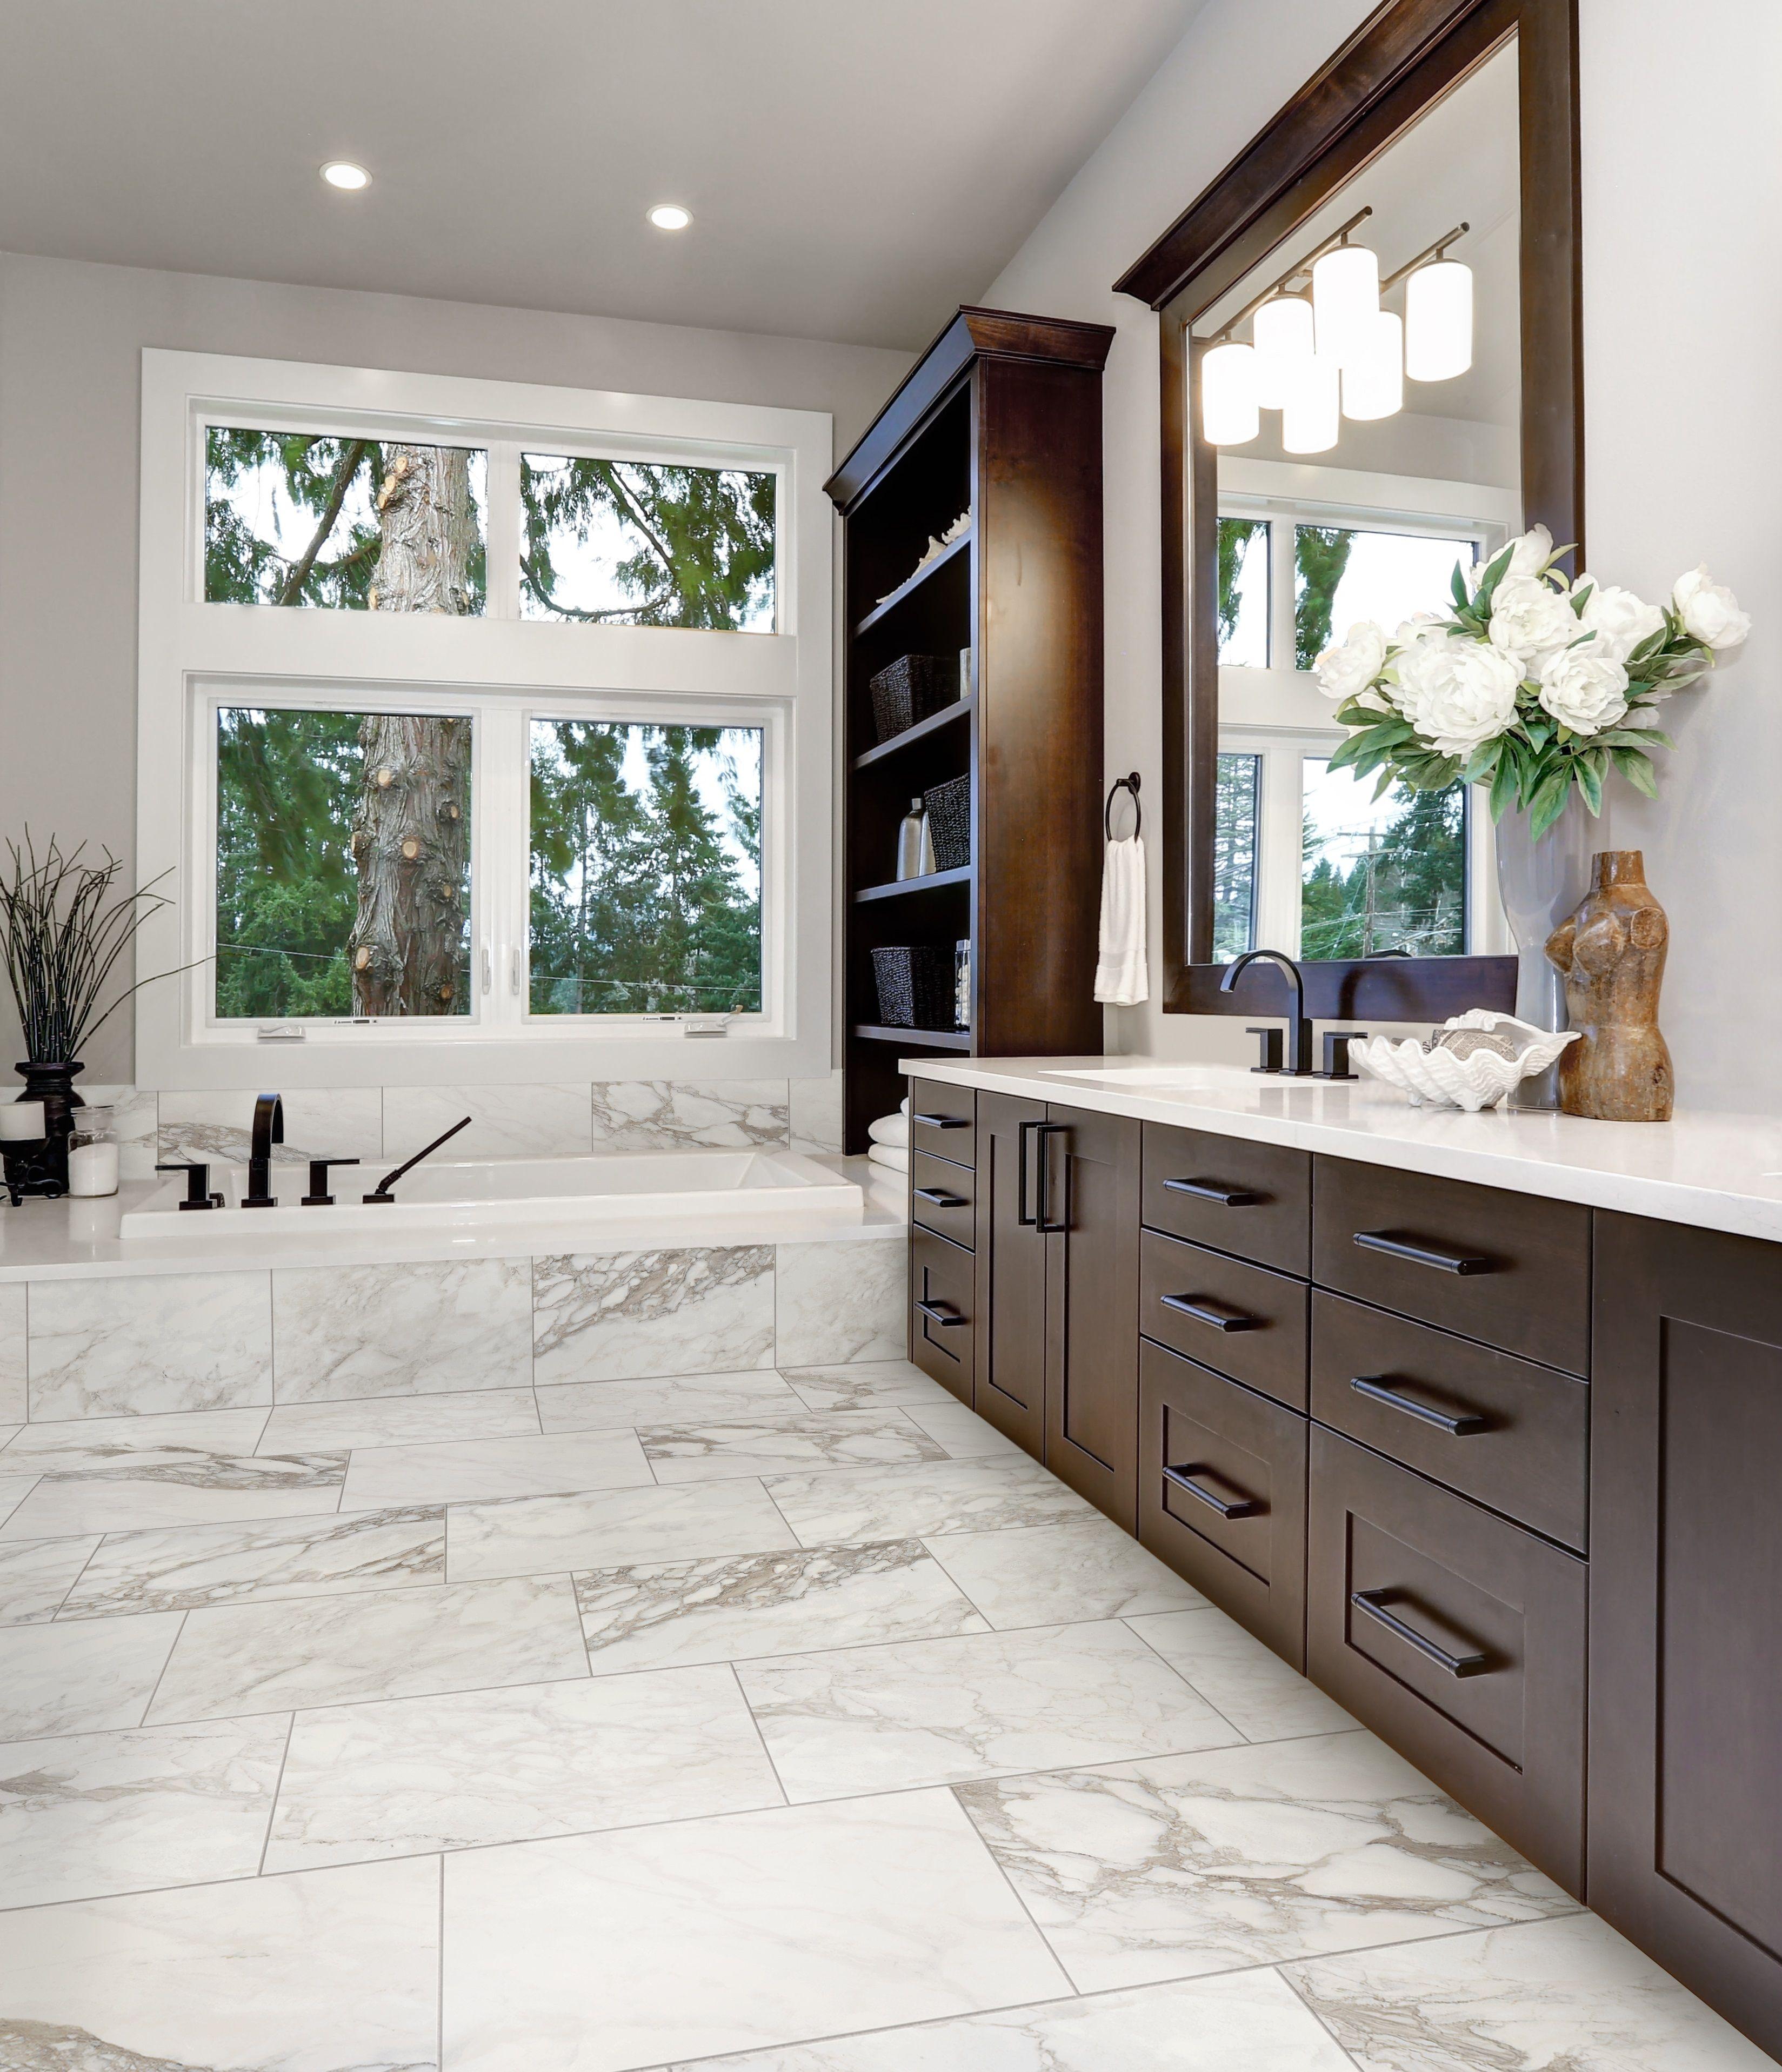 Marble Look Tile Tile Floor Marble Look Tile Decor Interior Design